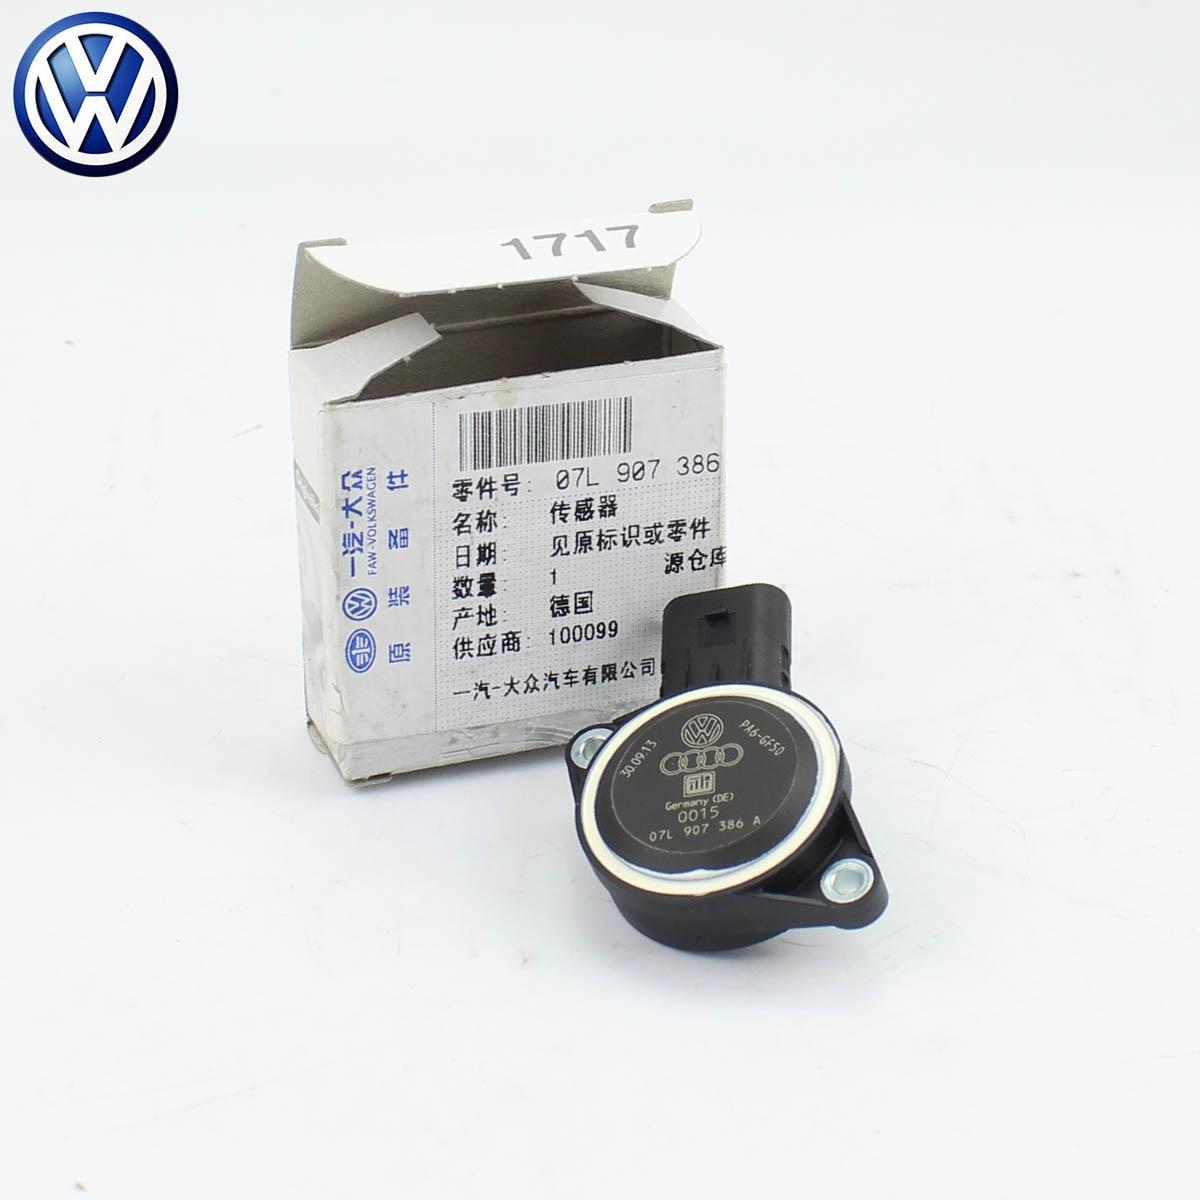 OEM Superb Air Intake Manifold Flap Position Sensor 07L 907 386 A For VW Passat CC NF Golf Jetta MK6 Passat B6 B7 oxygen air fuel sensor oem 89467 48040 afr sensor for toyota